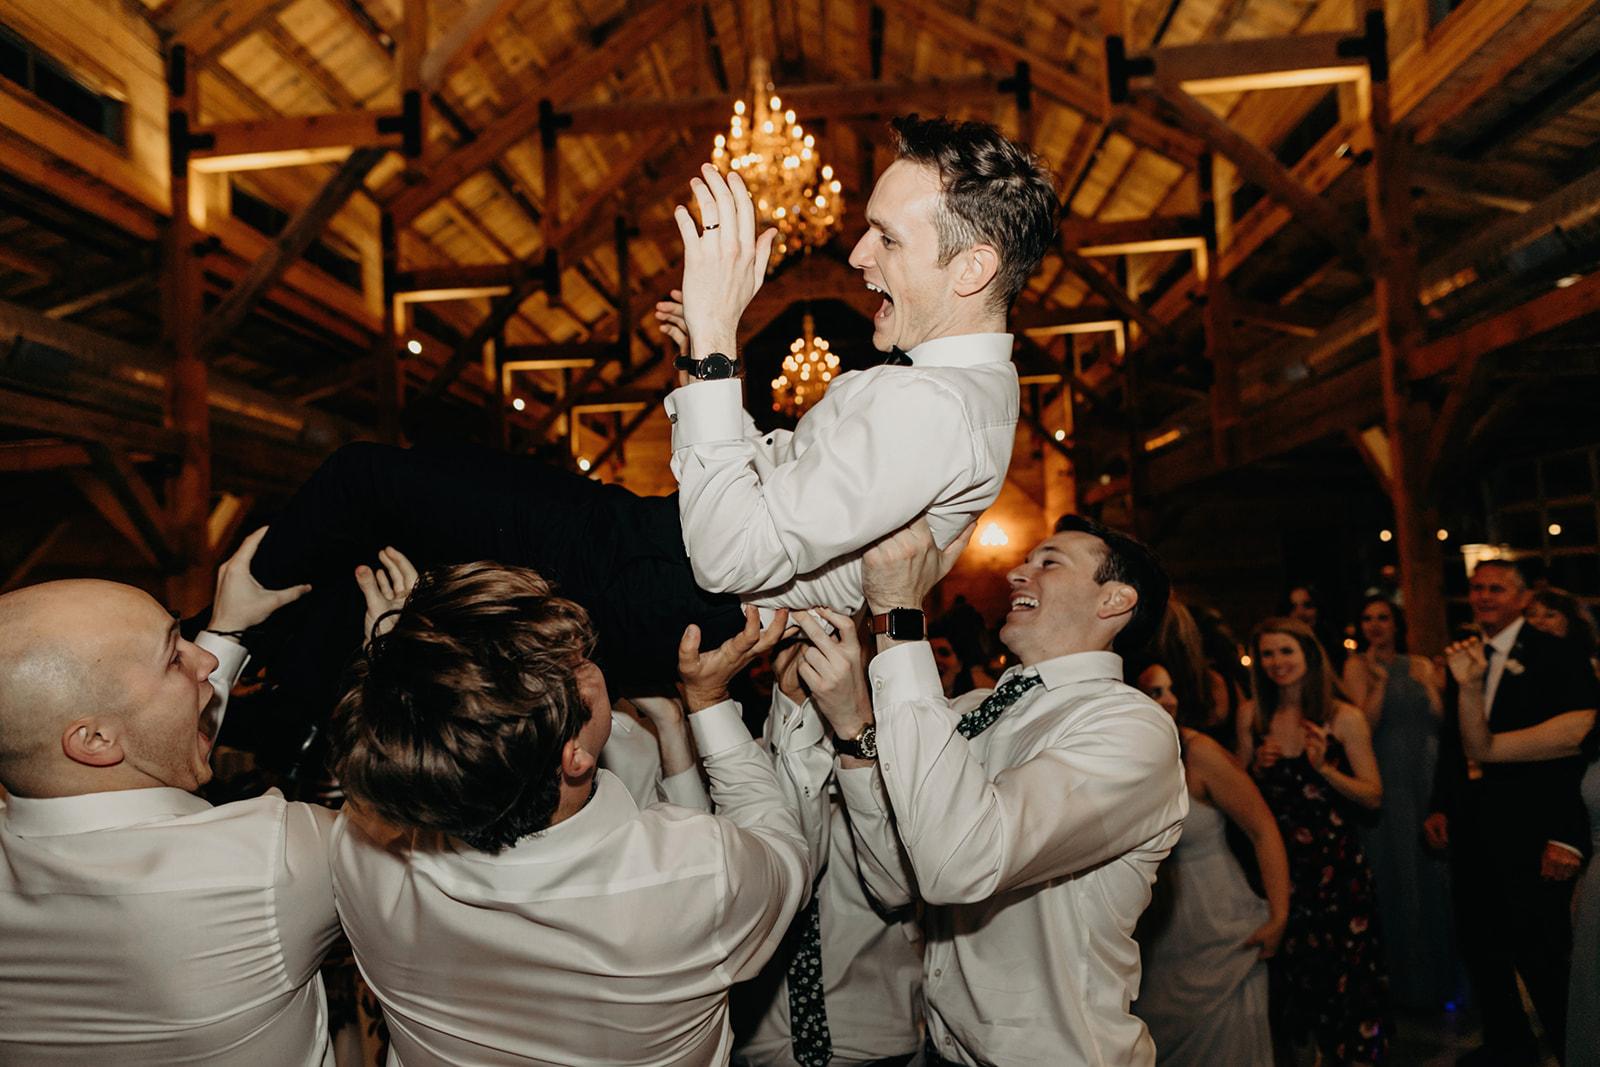 austin-wedding-lindsey-bryce-1013.jpg